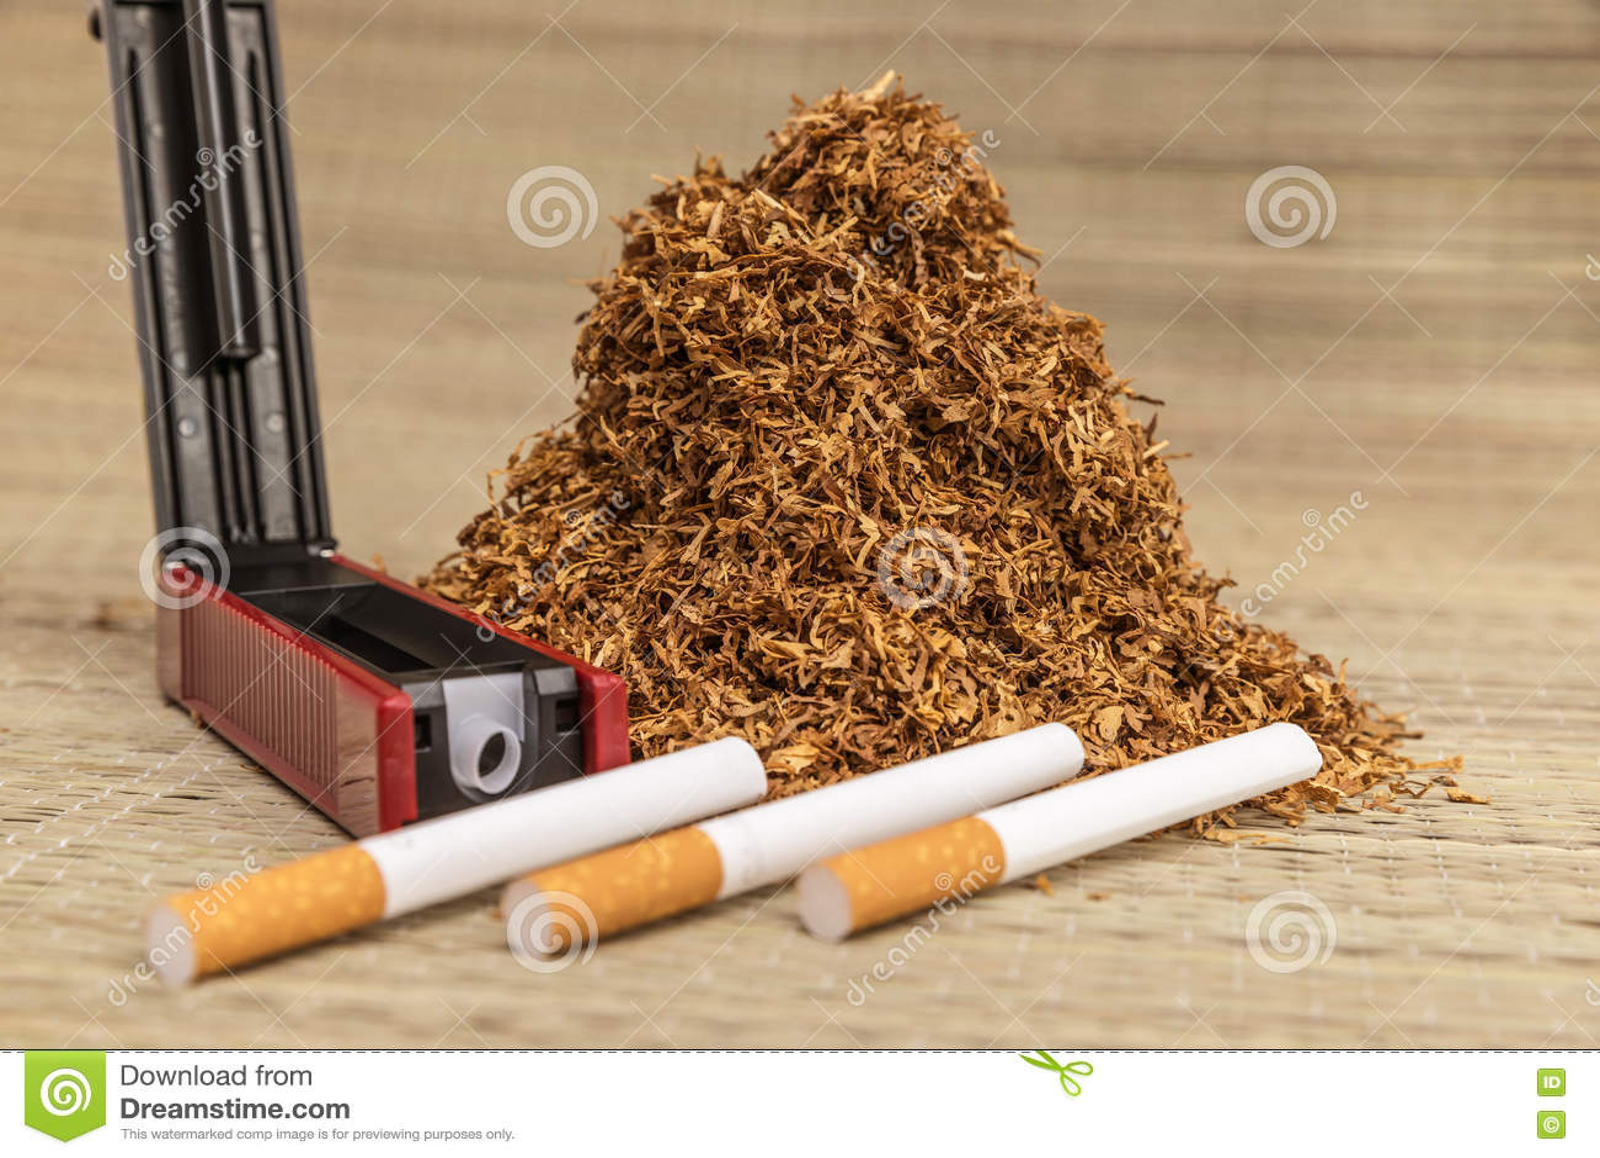 Пригорошня куря табака